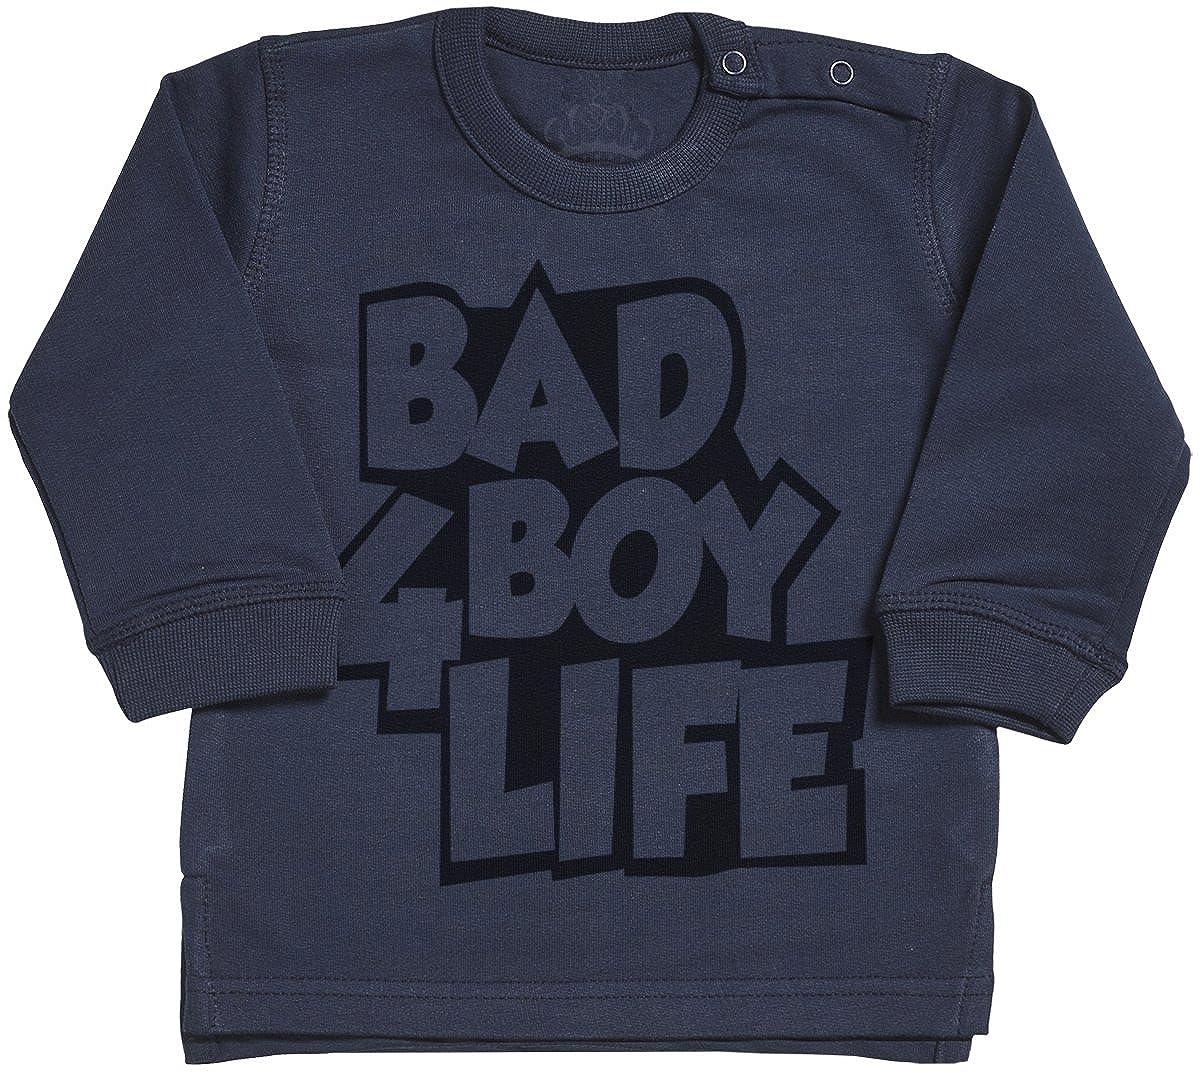 SR Bad Boy 4 Life Baby Sweater Navy Baby Jumper Baby Sweatshirt Baby Girl Sweater Baby Boy Sweater